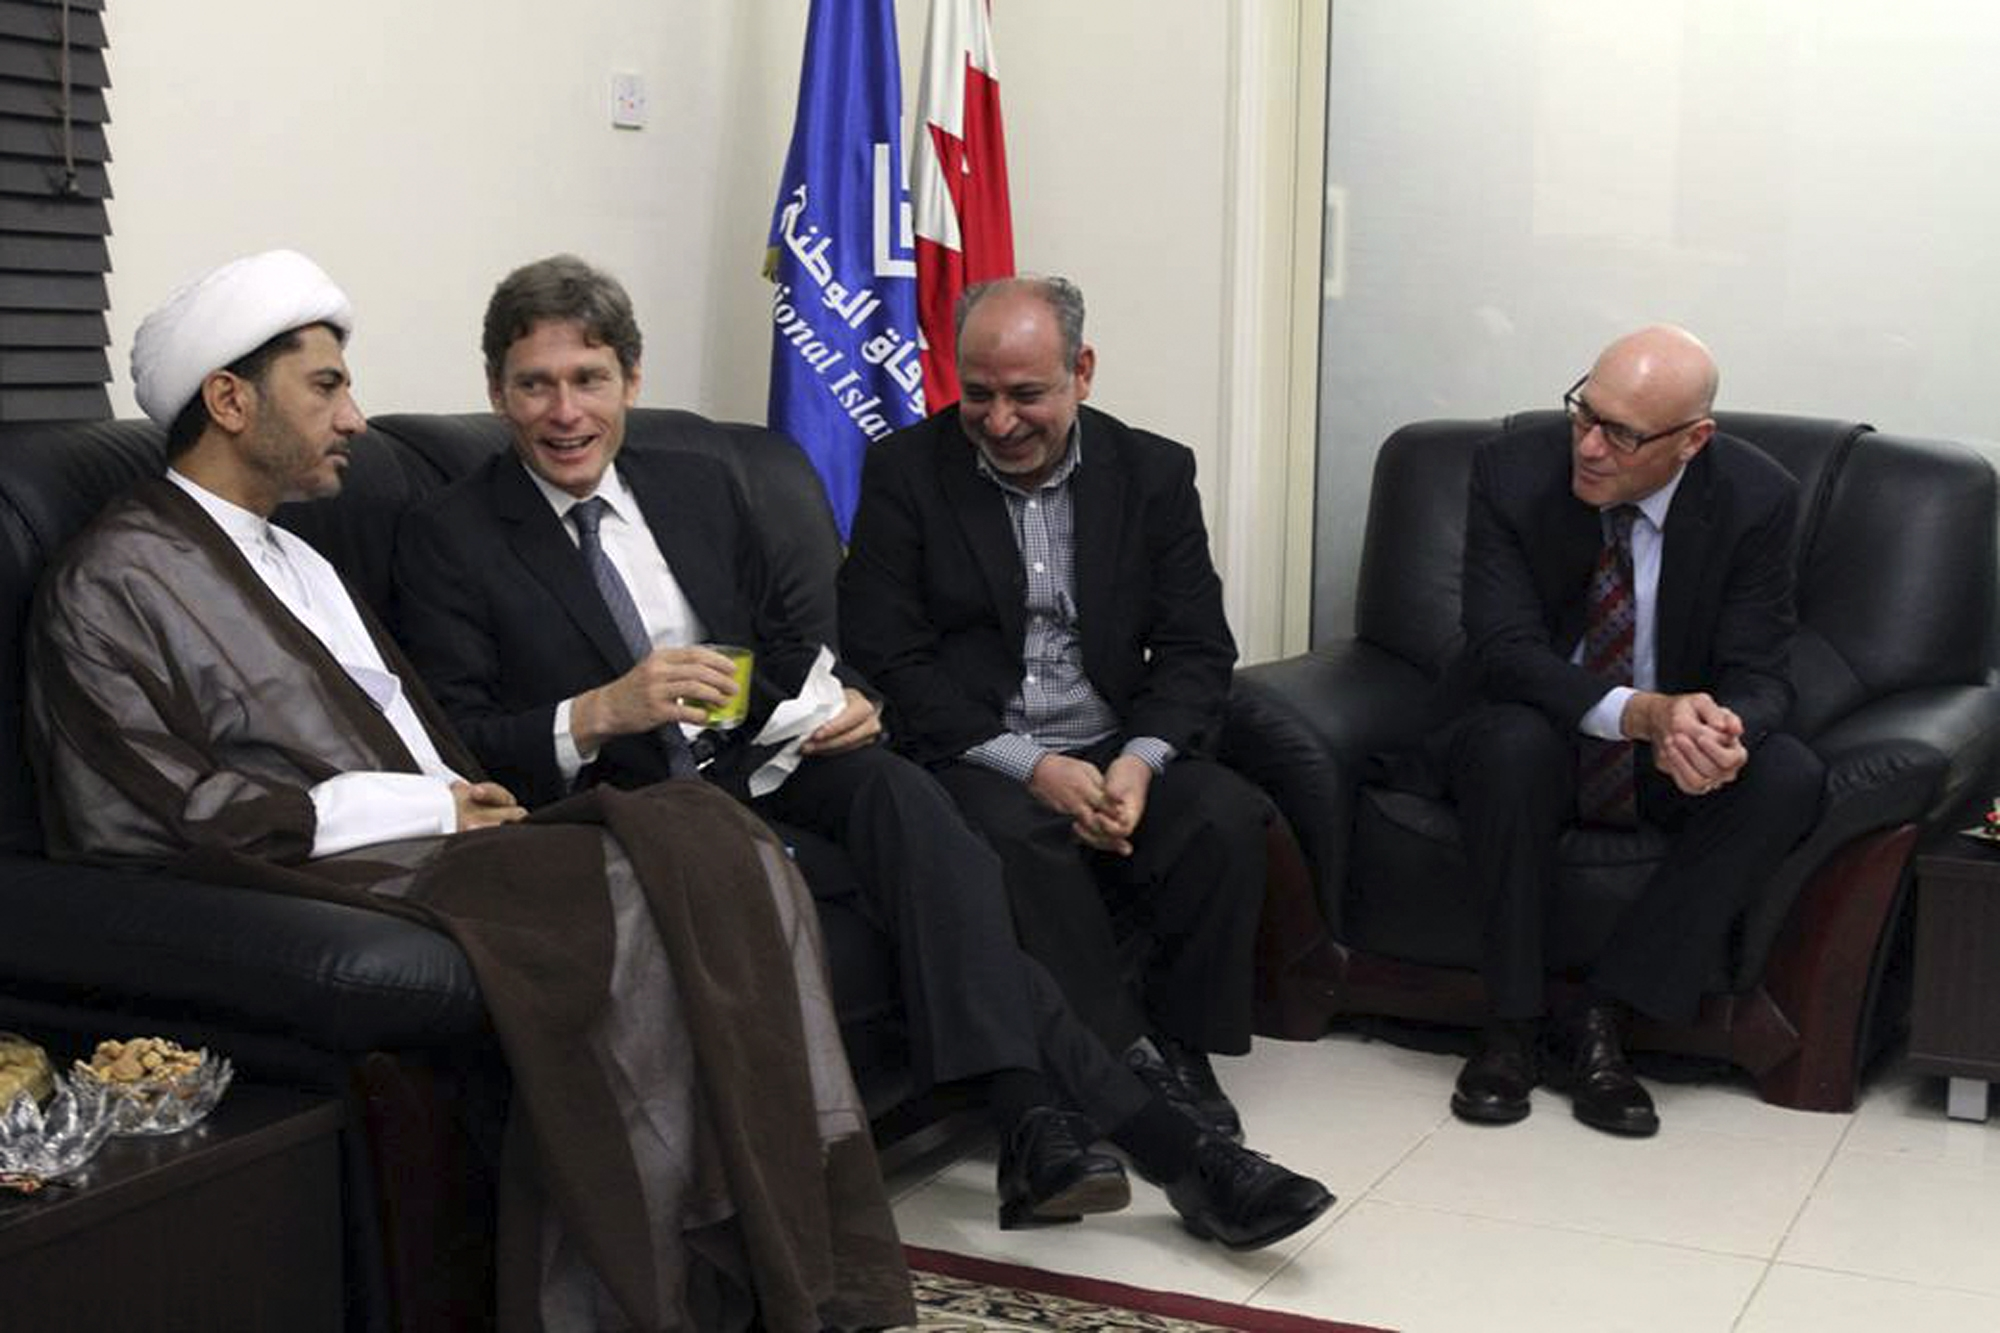 Tom Malinowski, Ali Salman, Abdul Jalil Khalil, Timothy J. Pounds